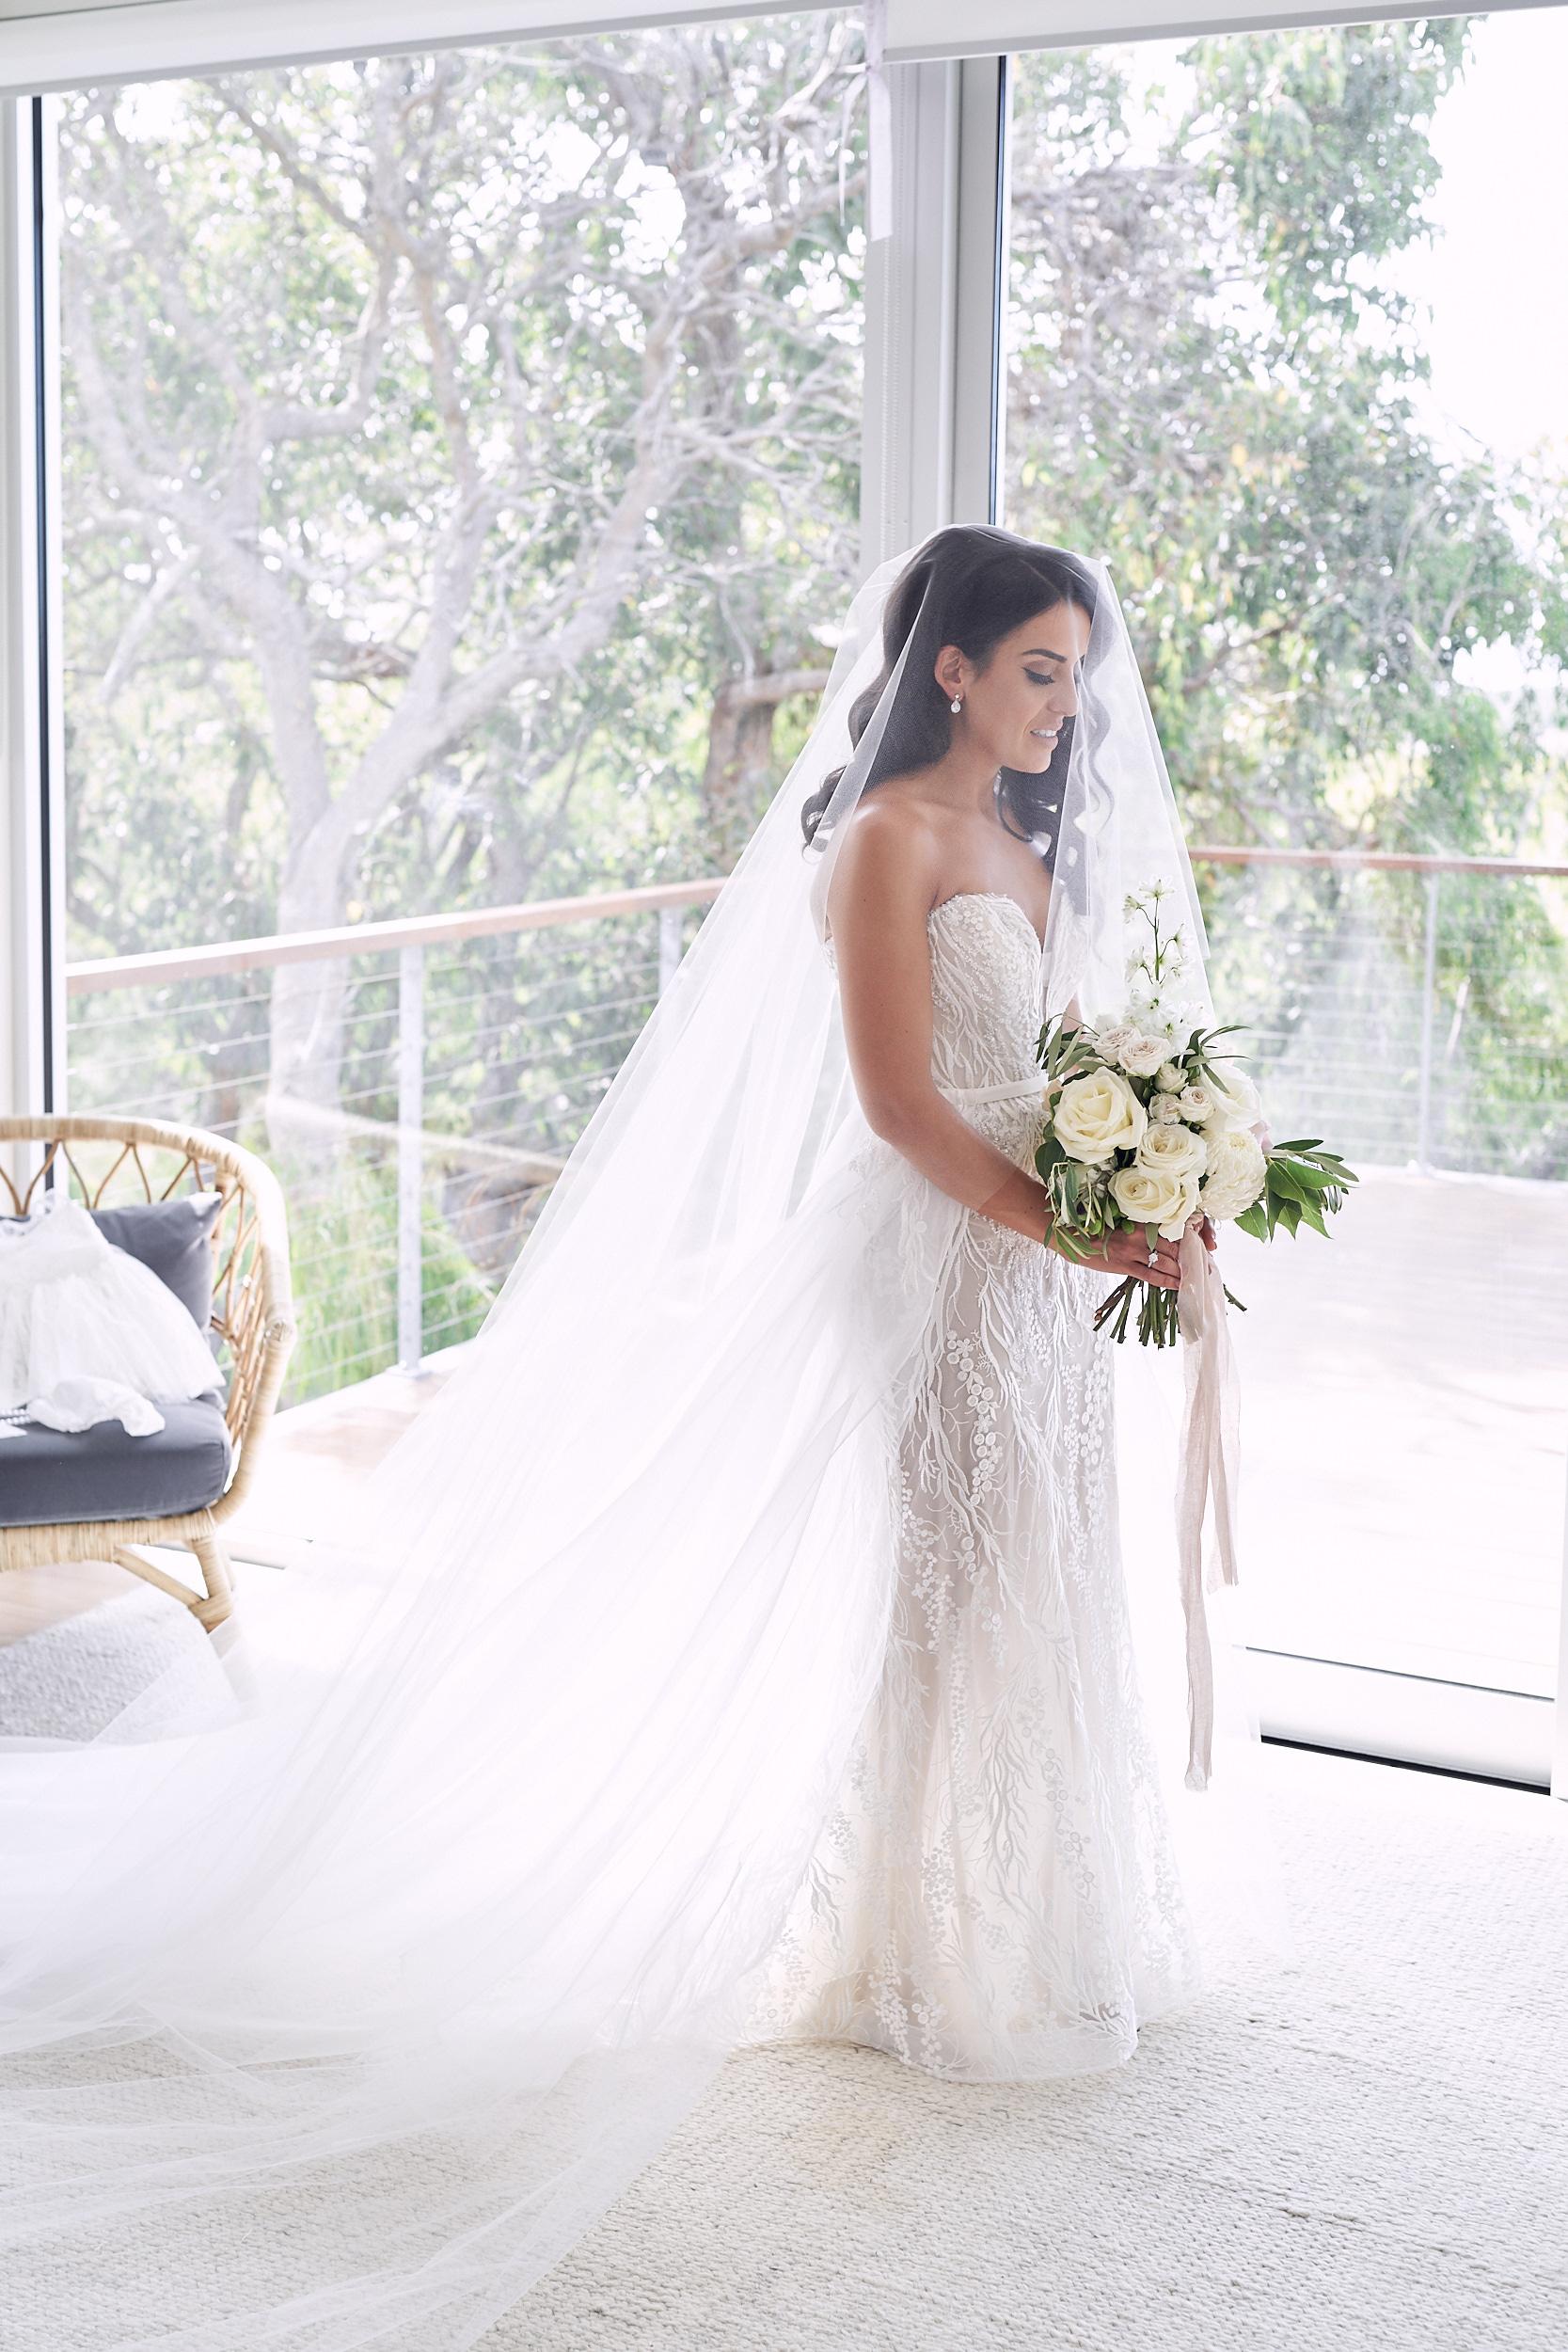 LR_JandA-aravina-wedding-LostInLove 280.jpg